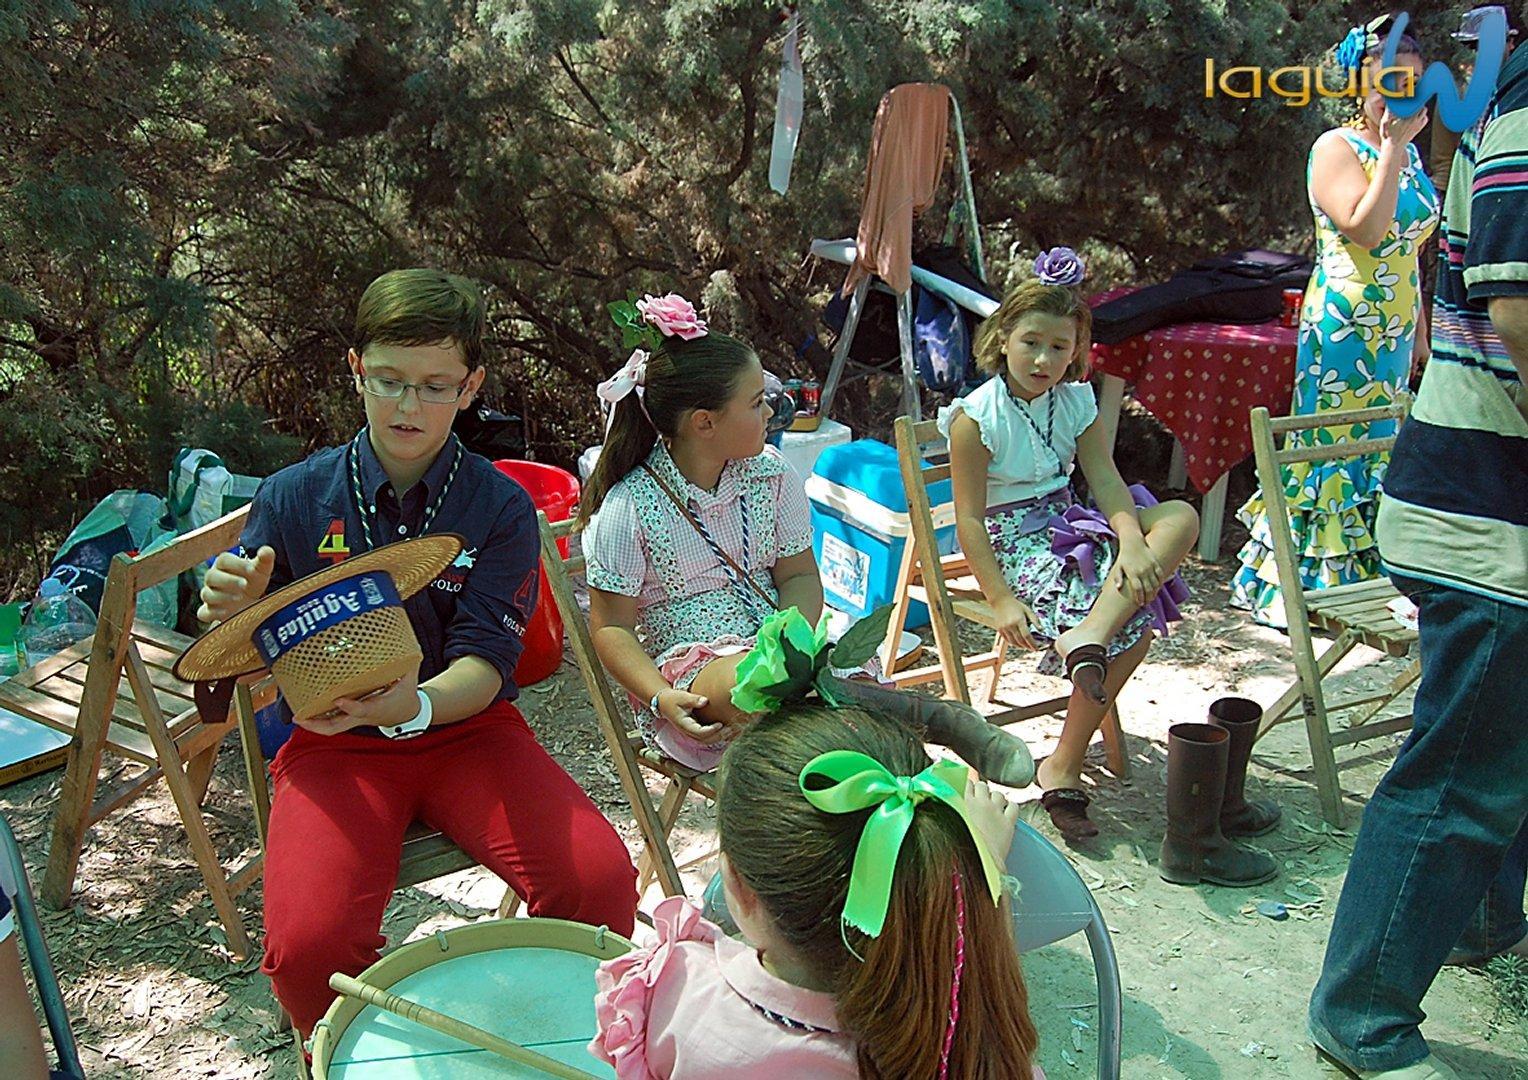 Romeria rociera 2012 archena, Domingo Rociero